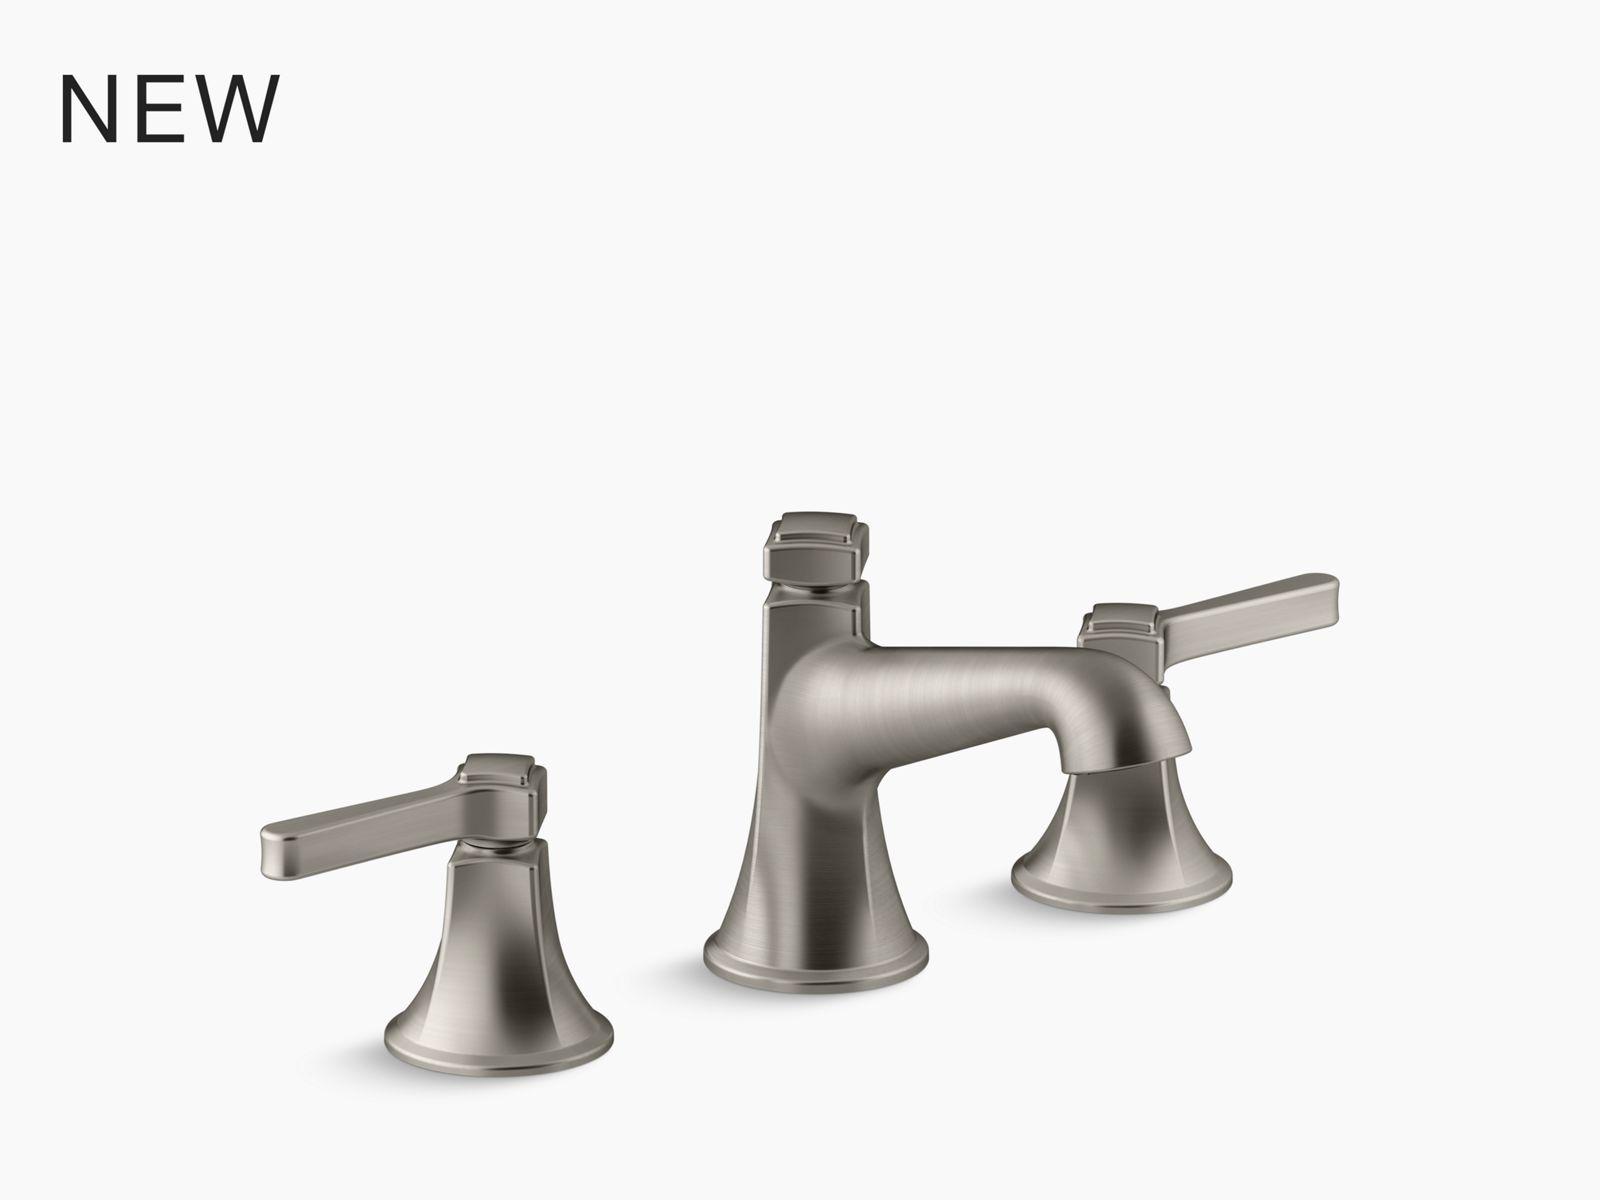 reve 39 pedestal bathroom sink with single faucet hole